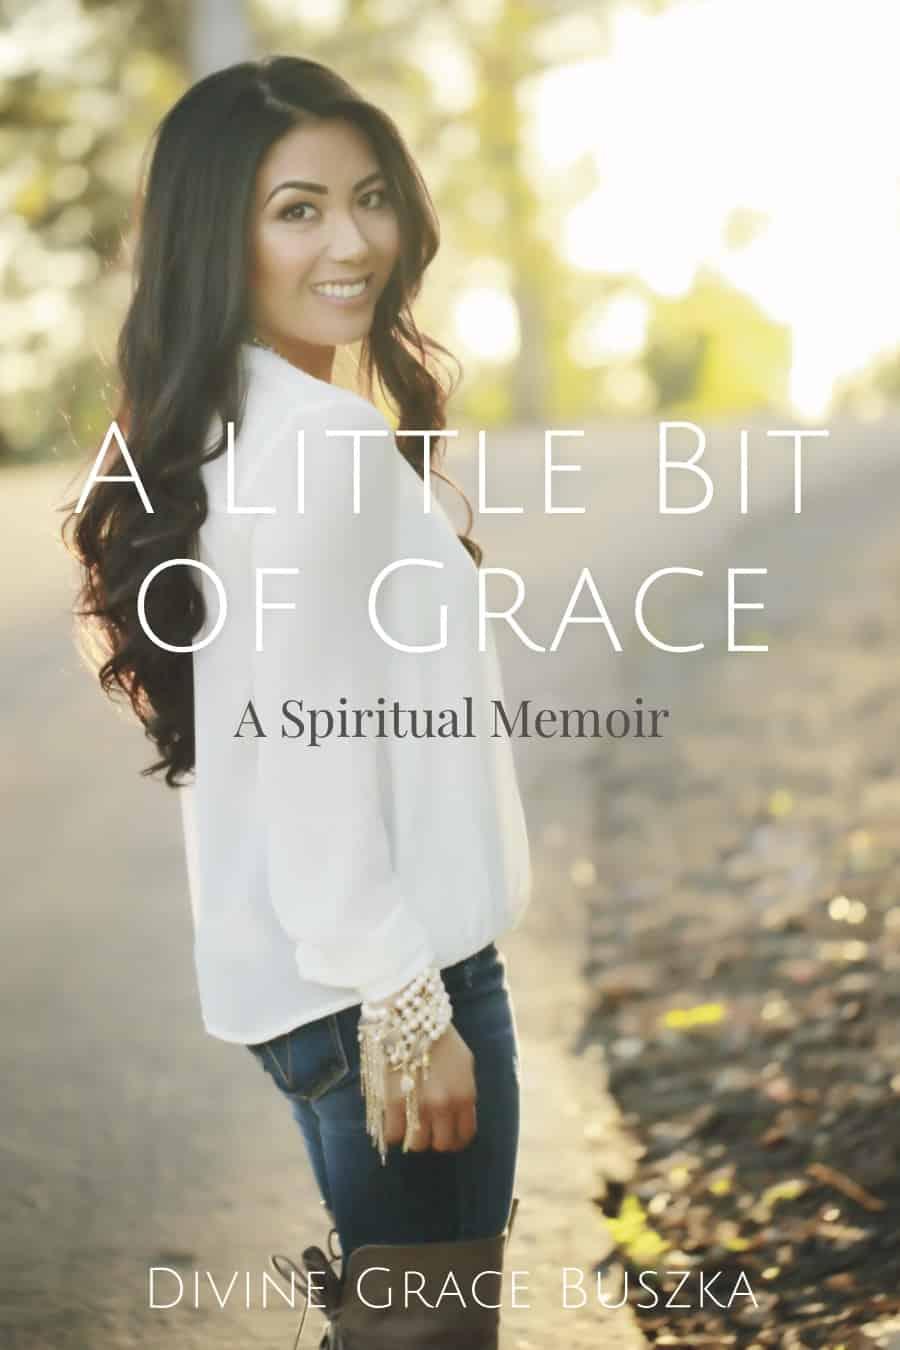 divine grace buszka, forgiveness, a litle bit of grace a spiritual memoir, books